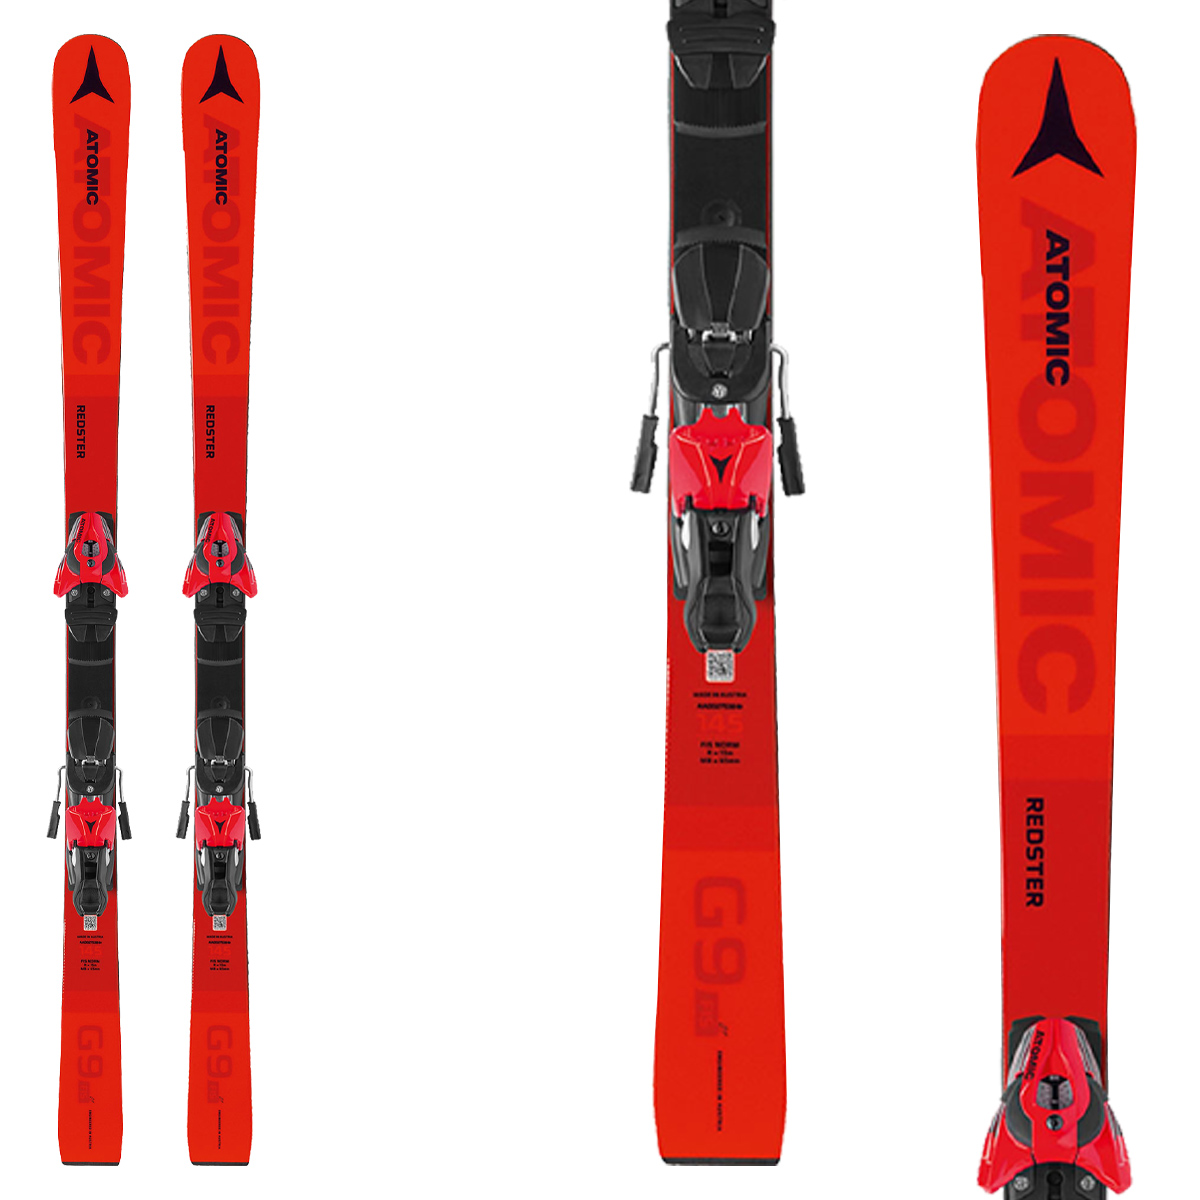 Ski Atomic Redster G9 Fis J-RP² With Bindings Z10